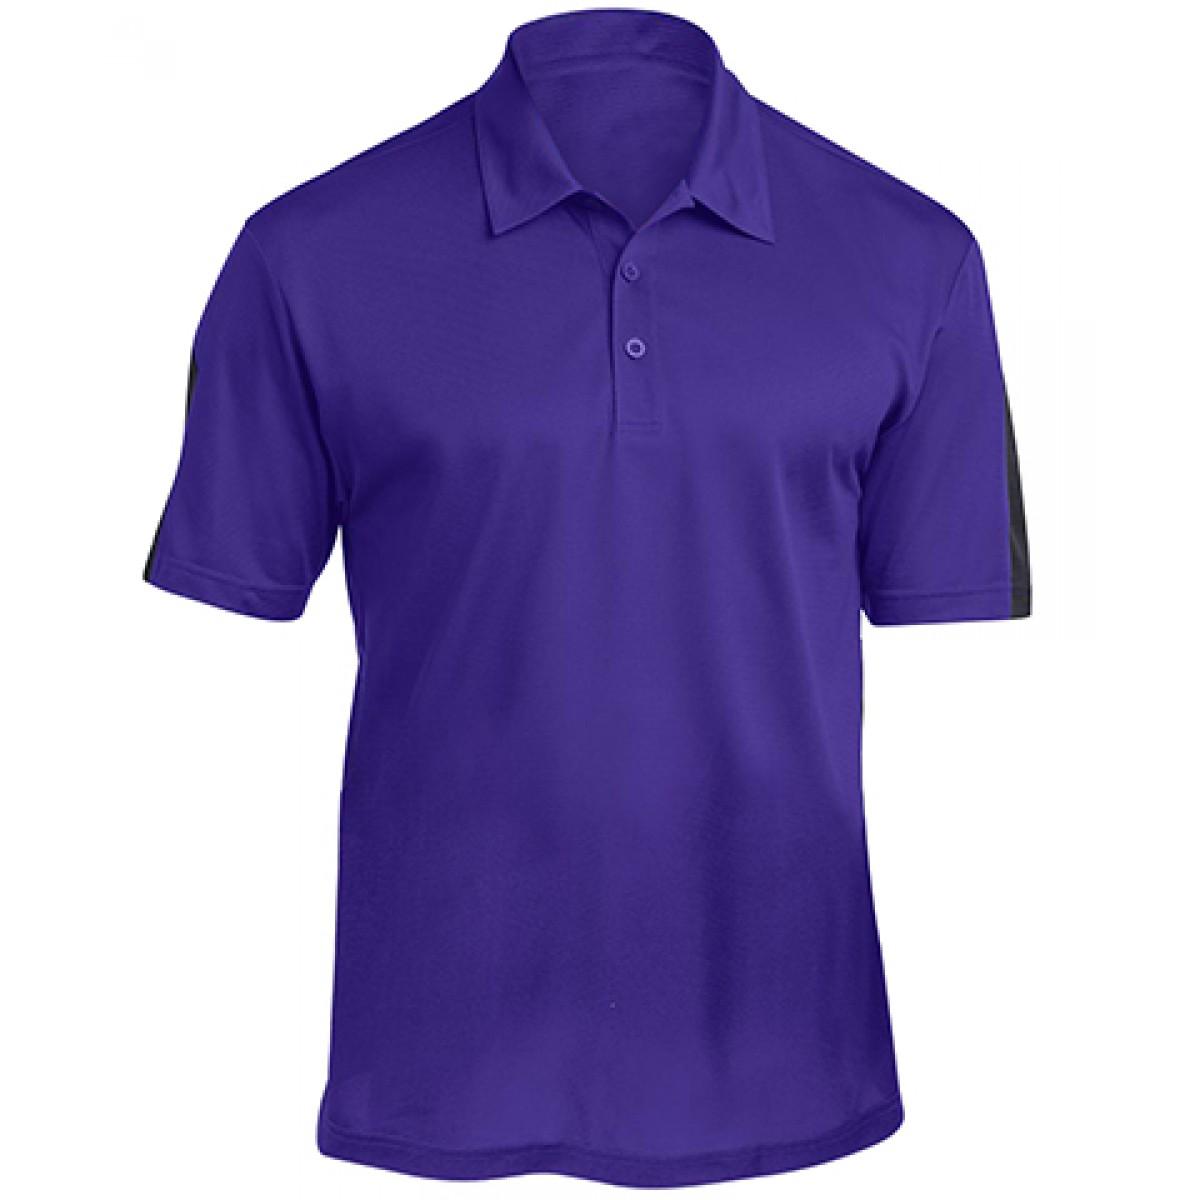 Textured Colorblock Polo-Purple/Black-2XL